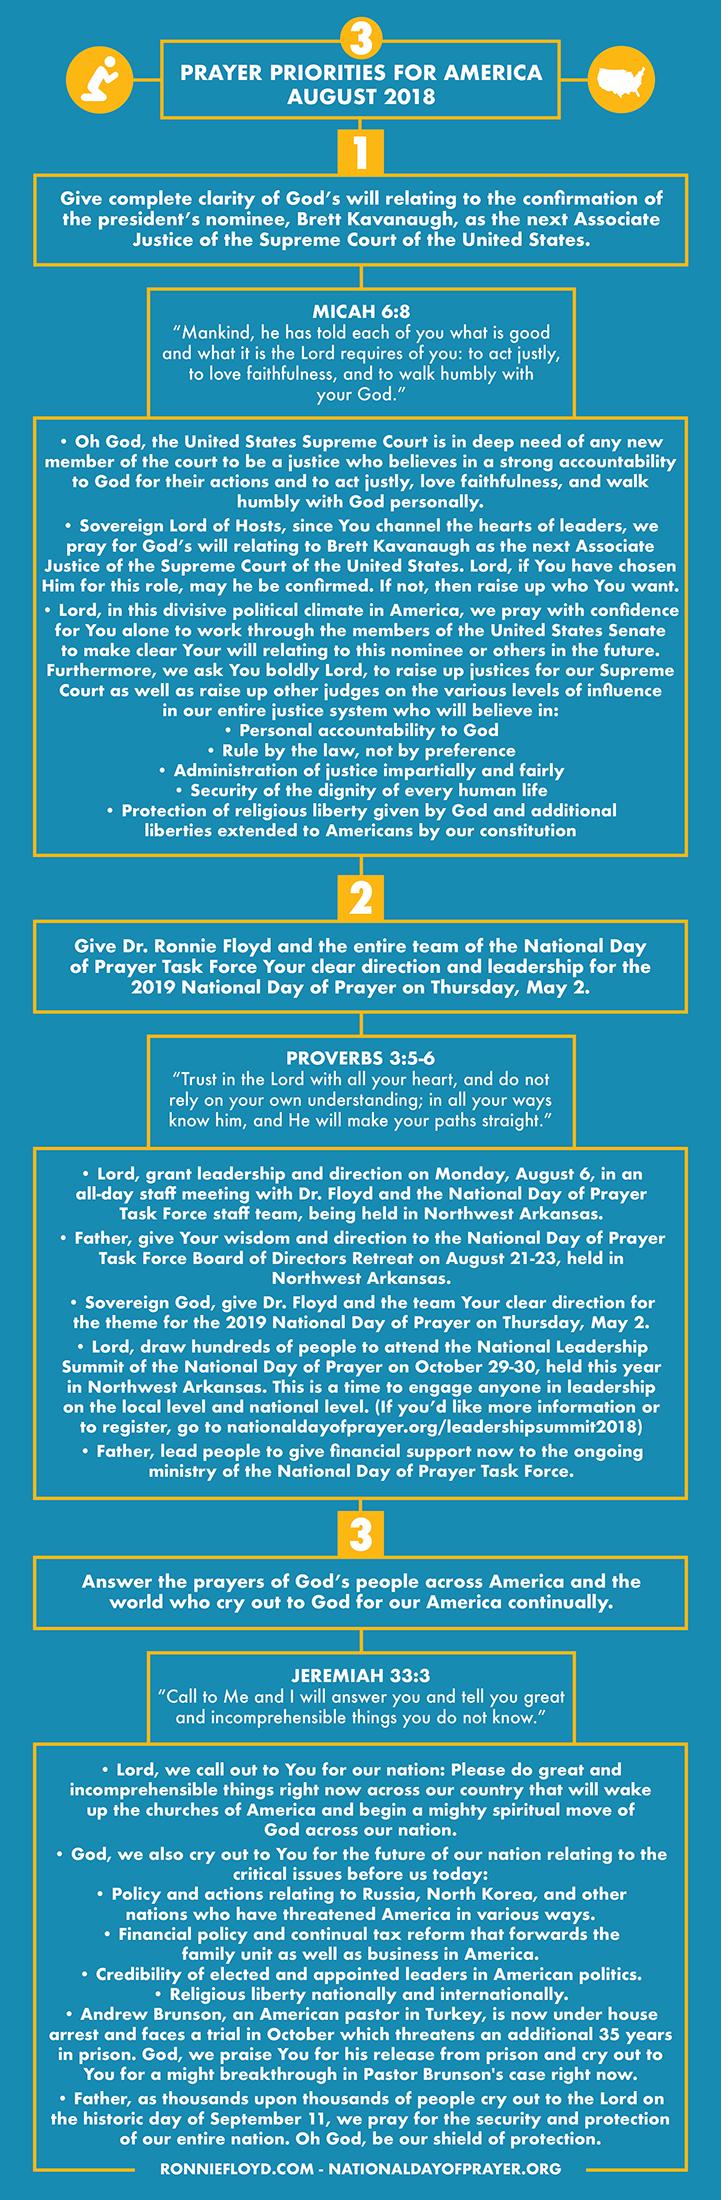 PrayerPoints_AUG-01 copy